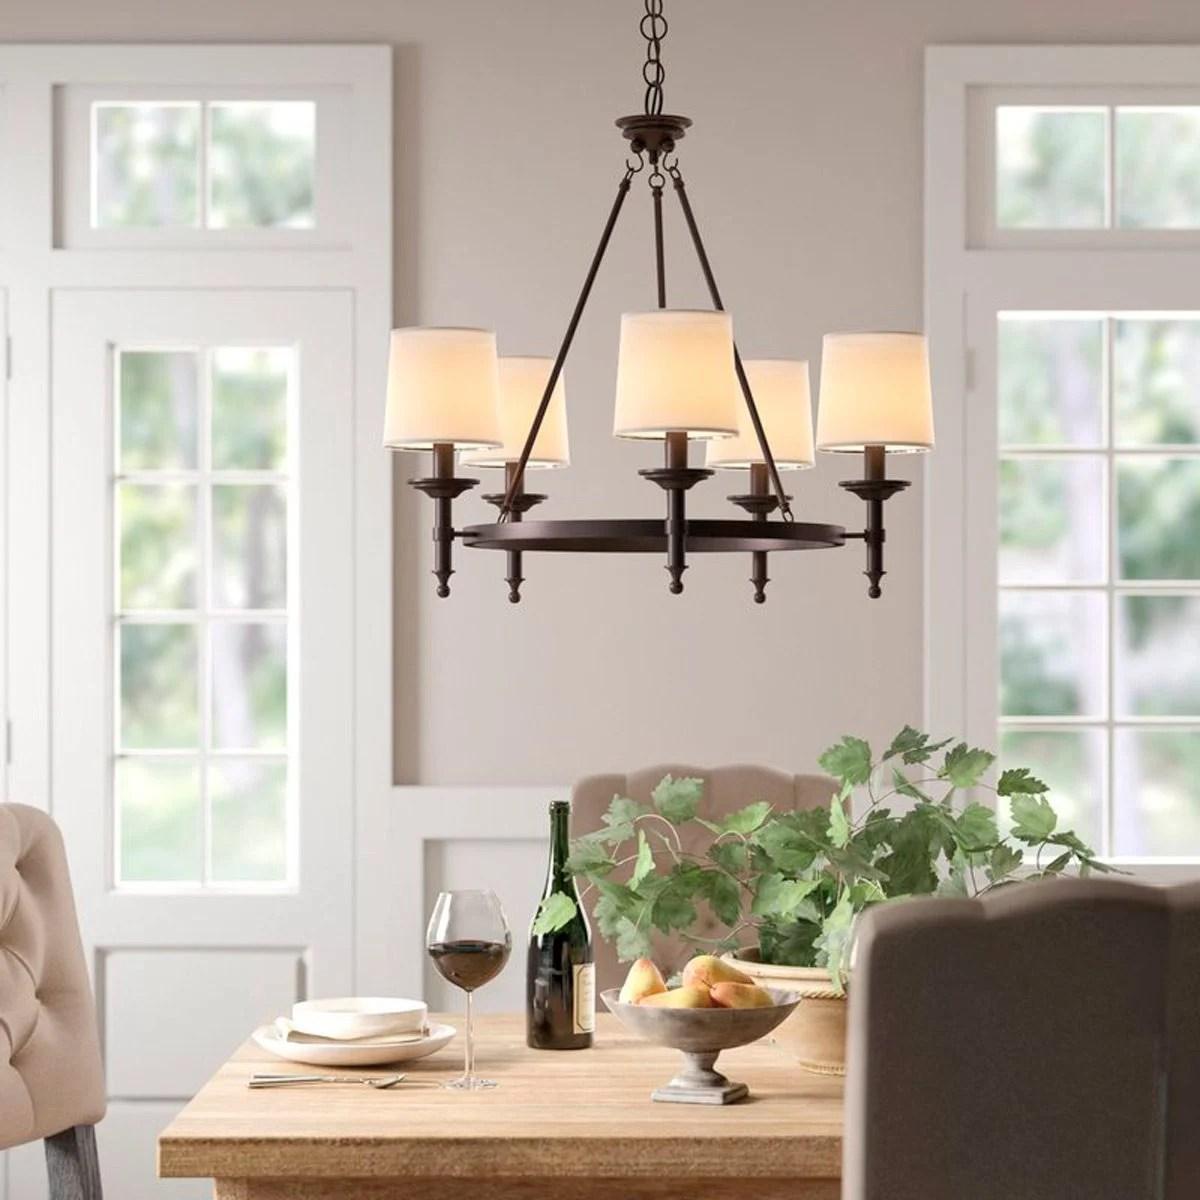 Cute Dining Room Chandelier Ideas Family Handyman